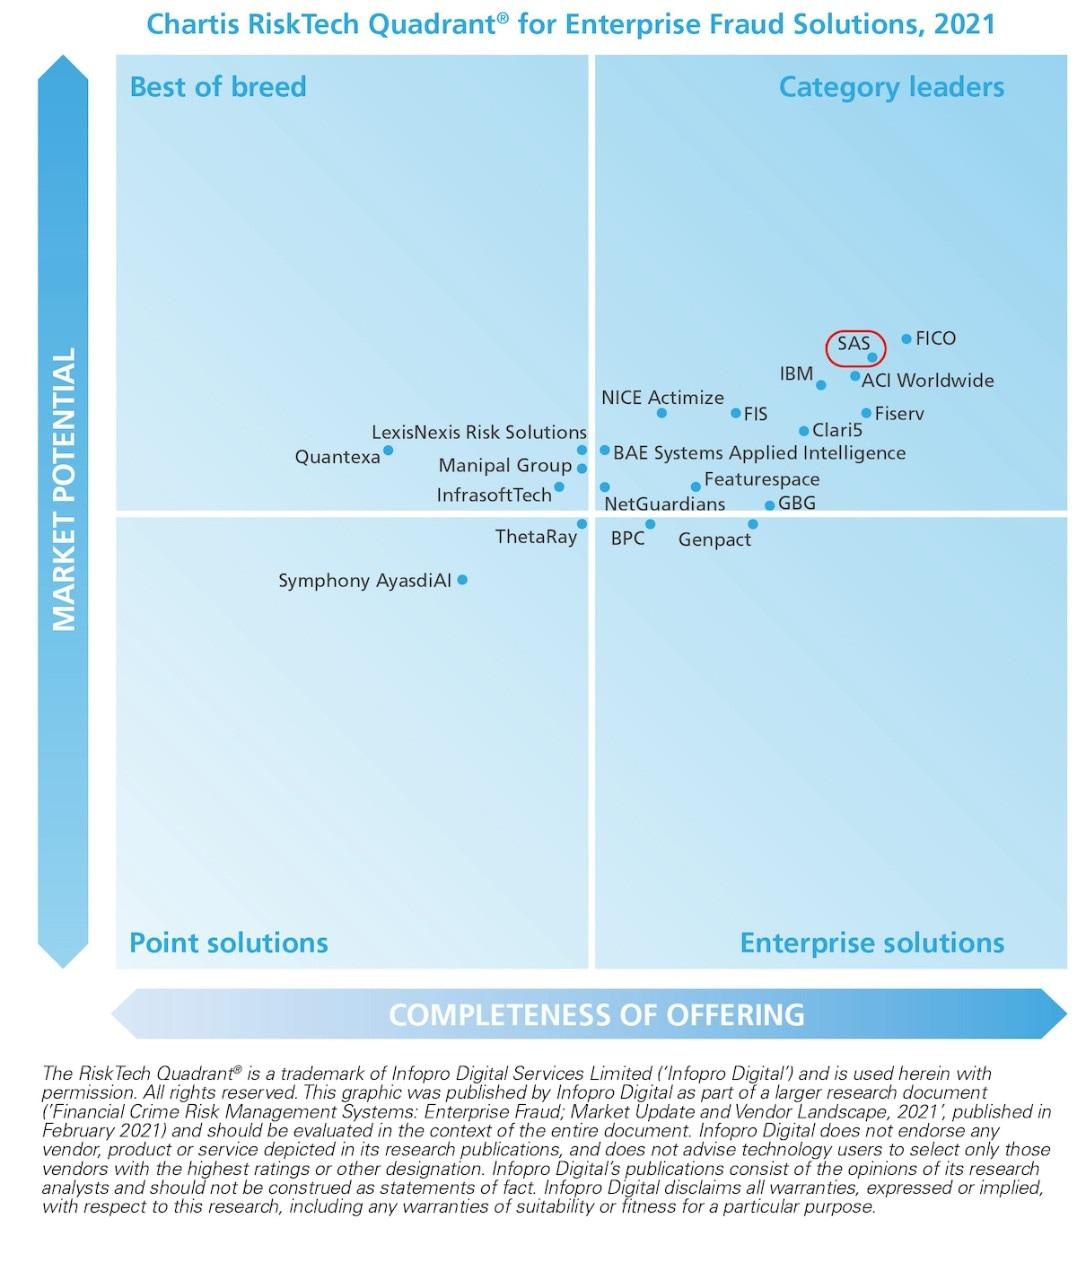 Chartis enterprise fraud infographic